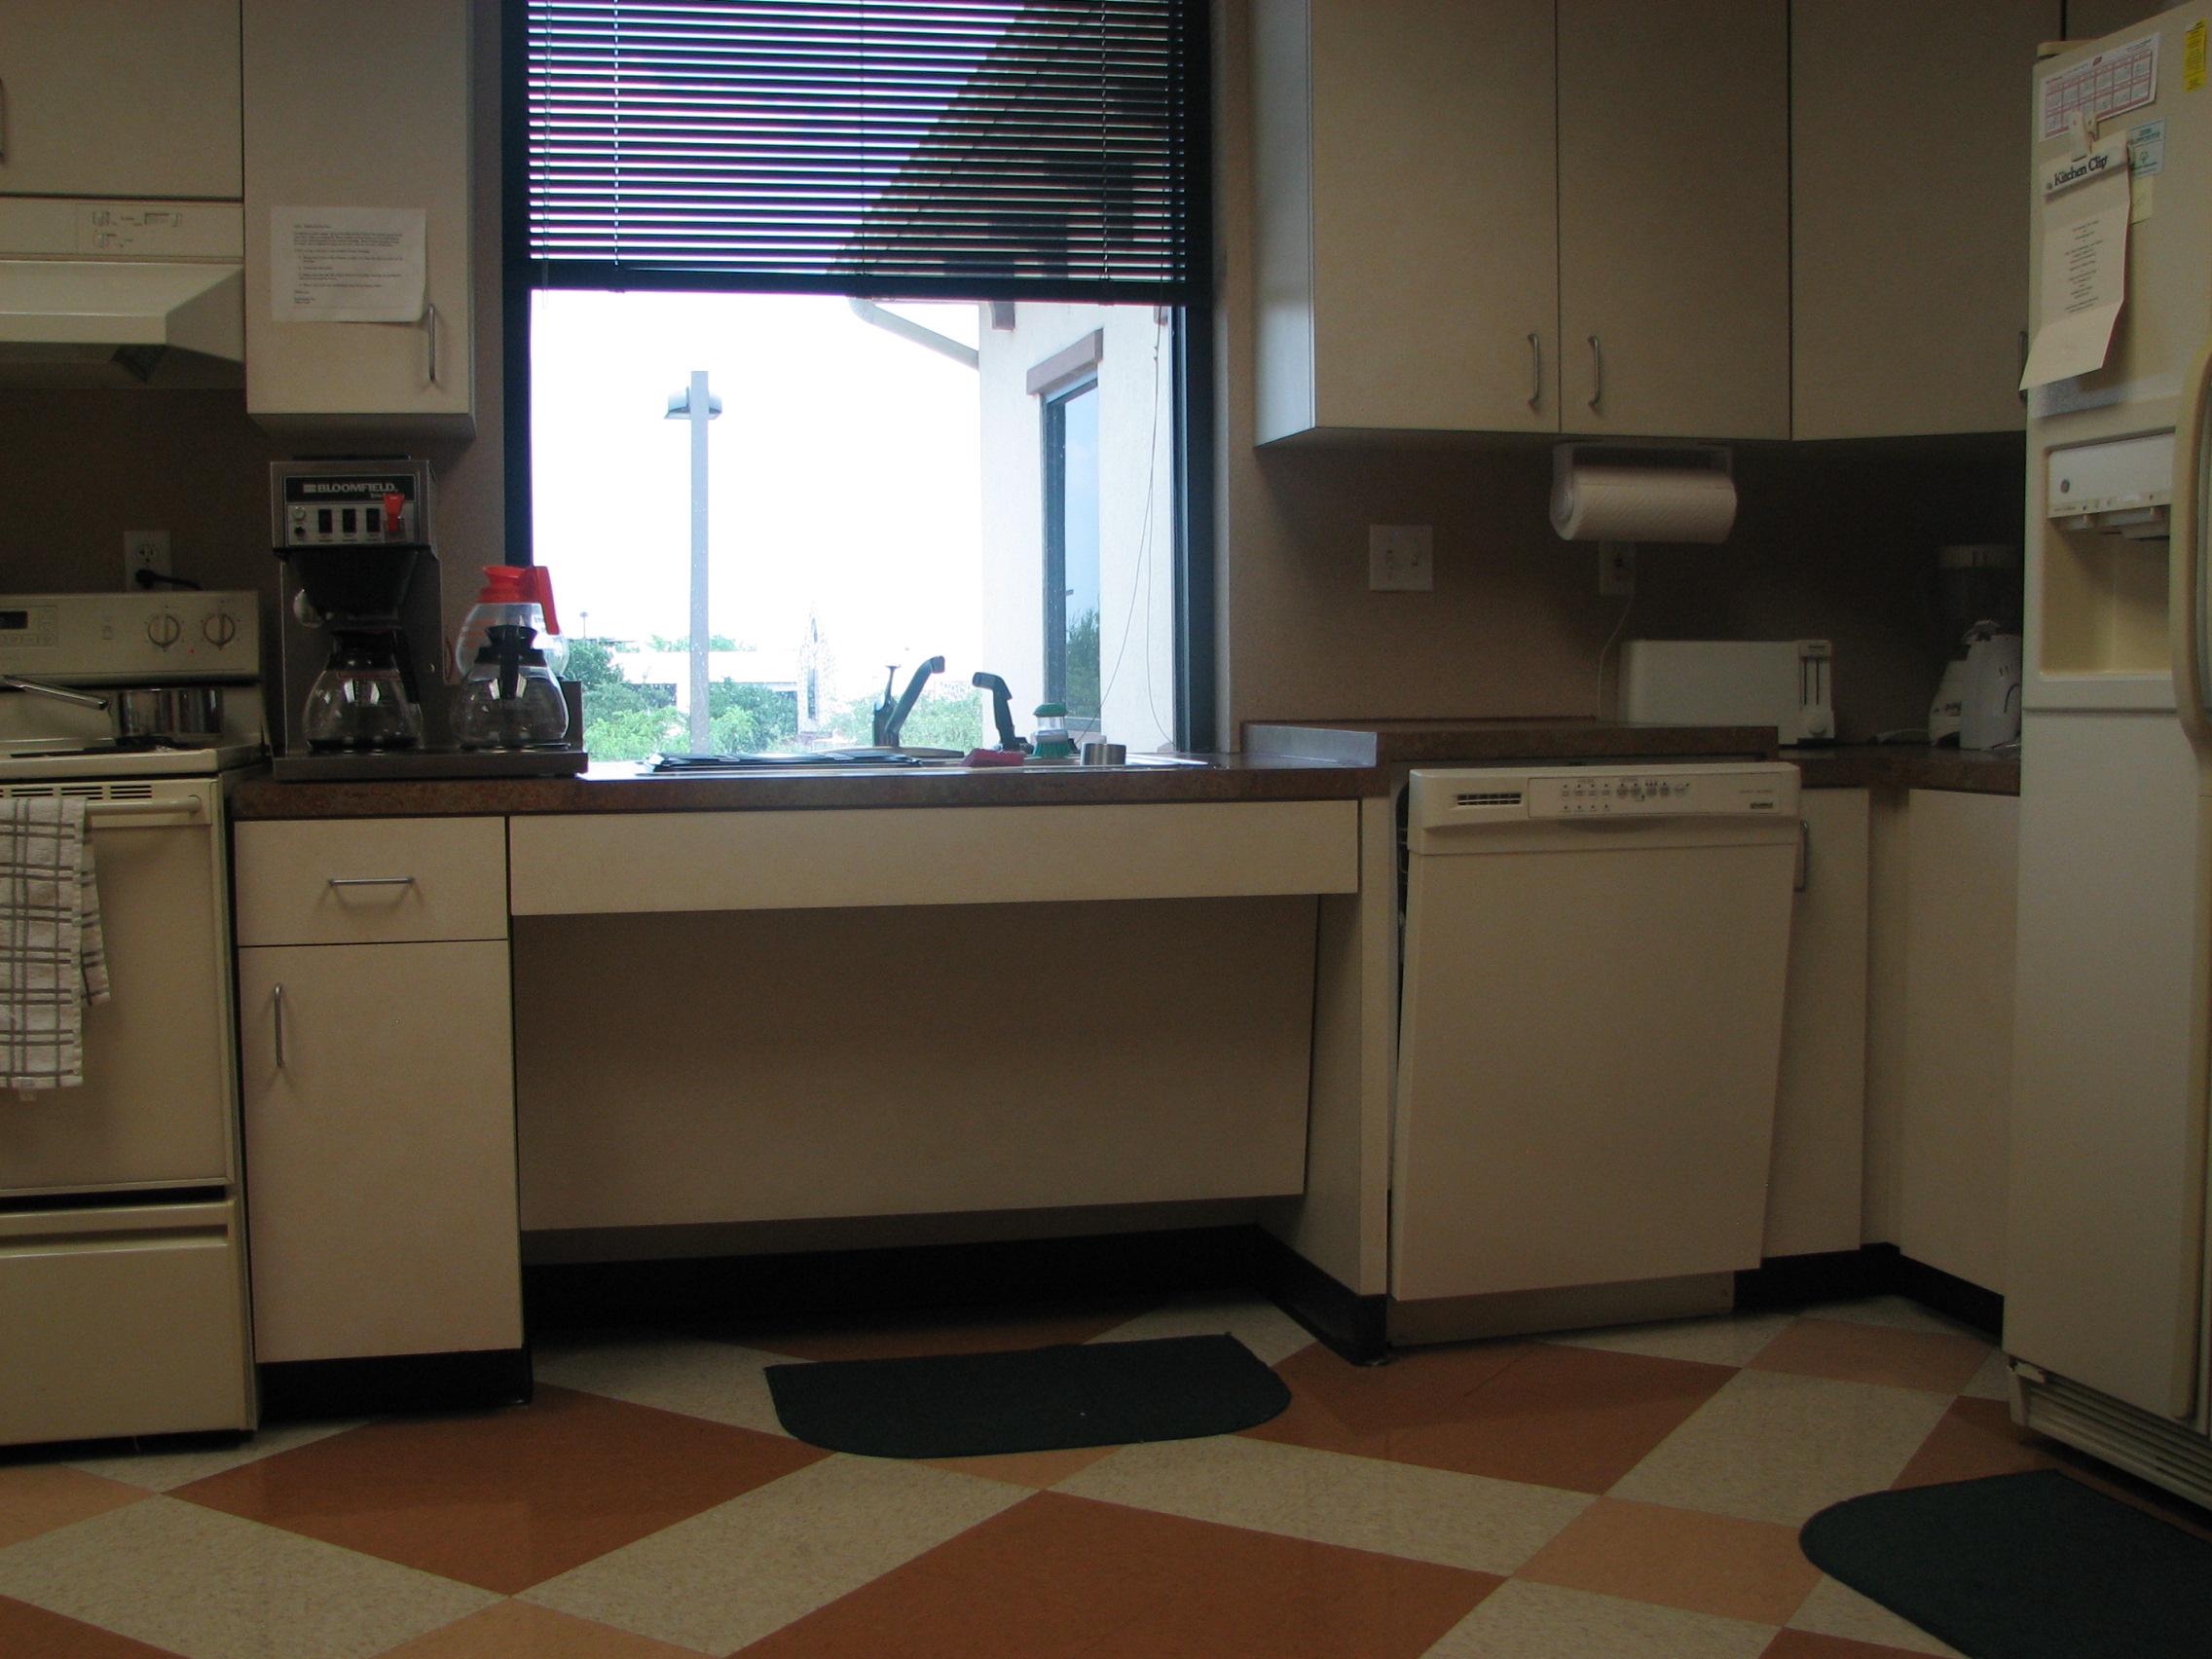 Austin ADA Compliant Cabinetry